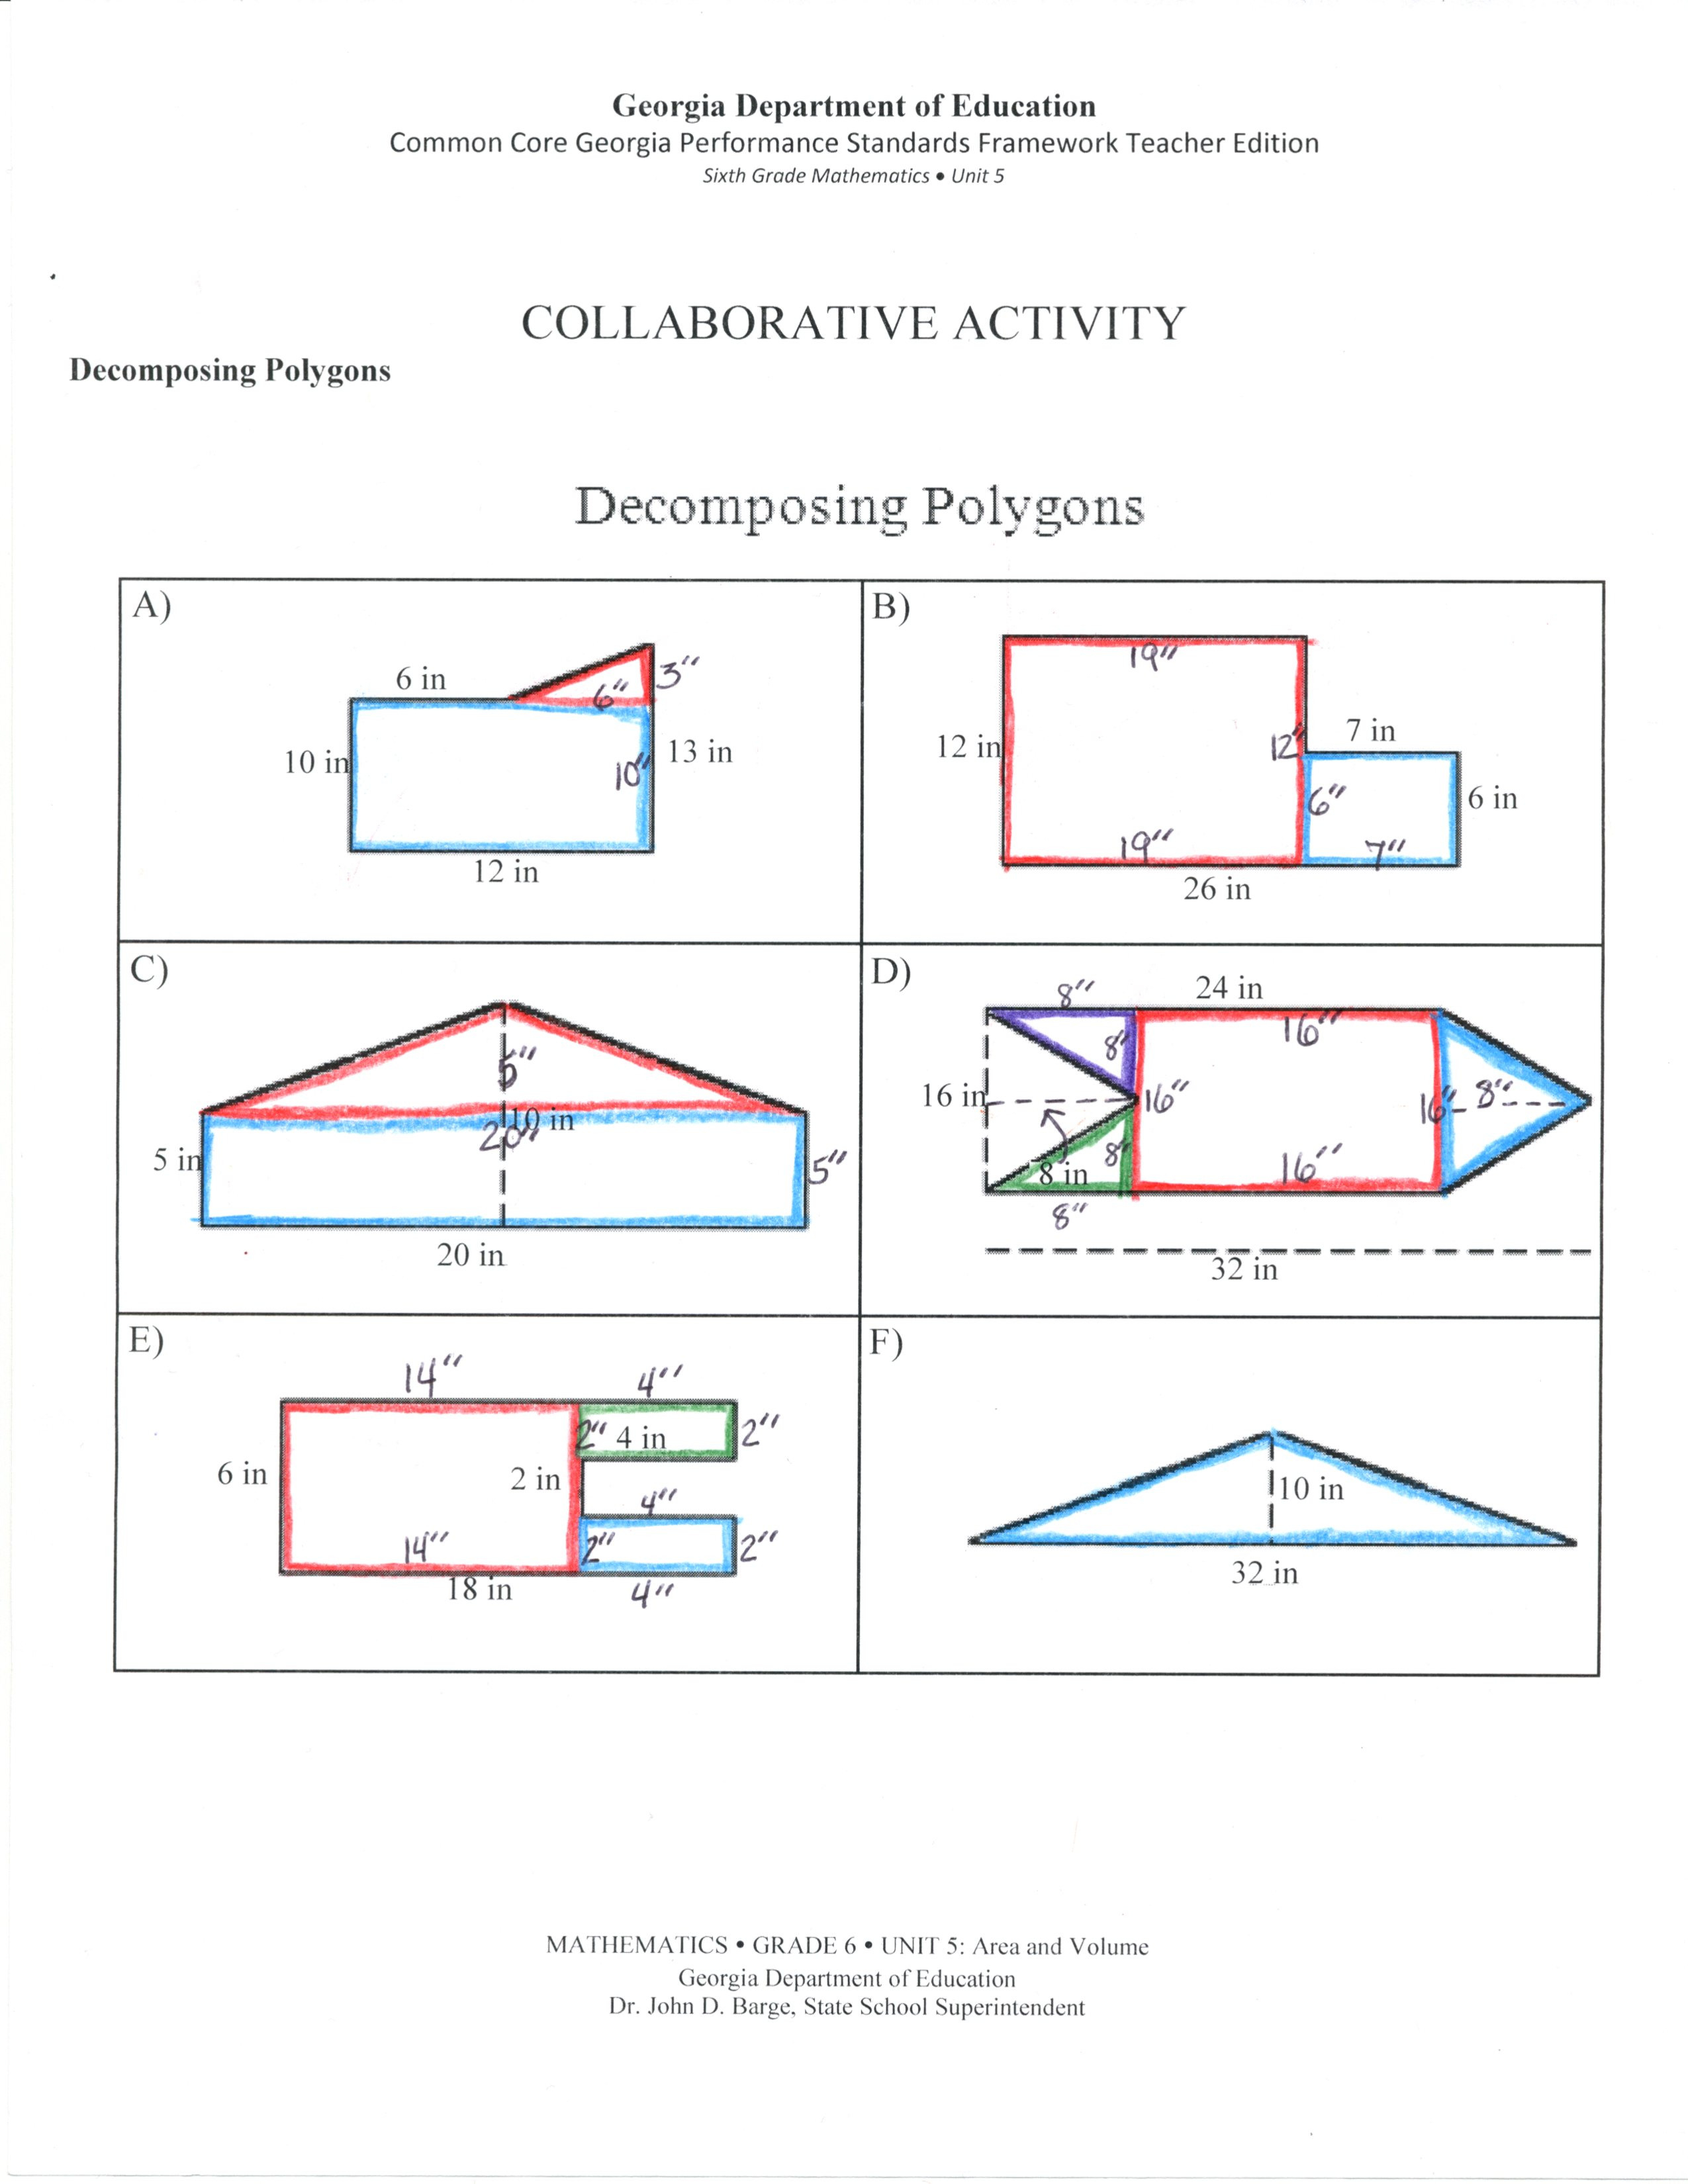 Composite Sc Composite Worksheet Usmc Fresh — db excel.com